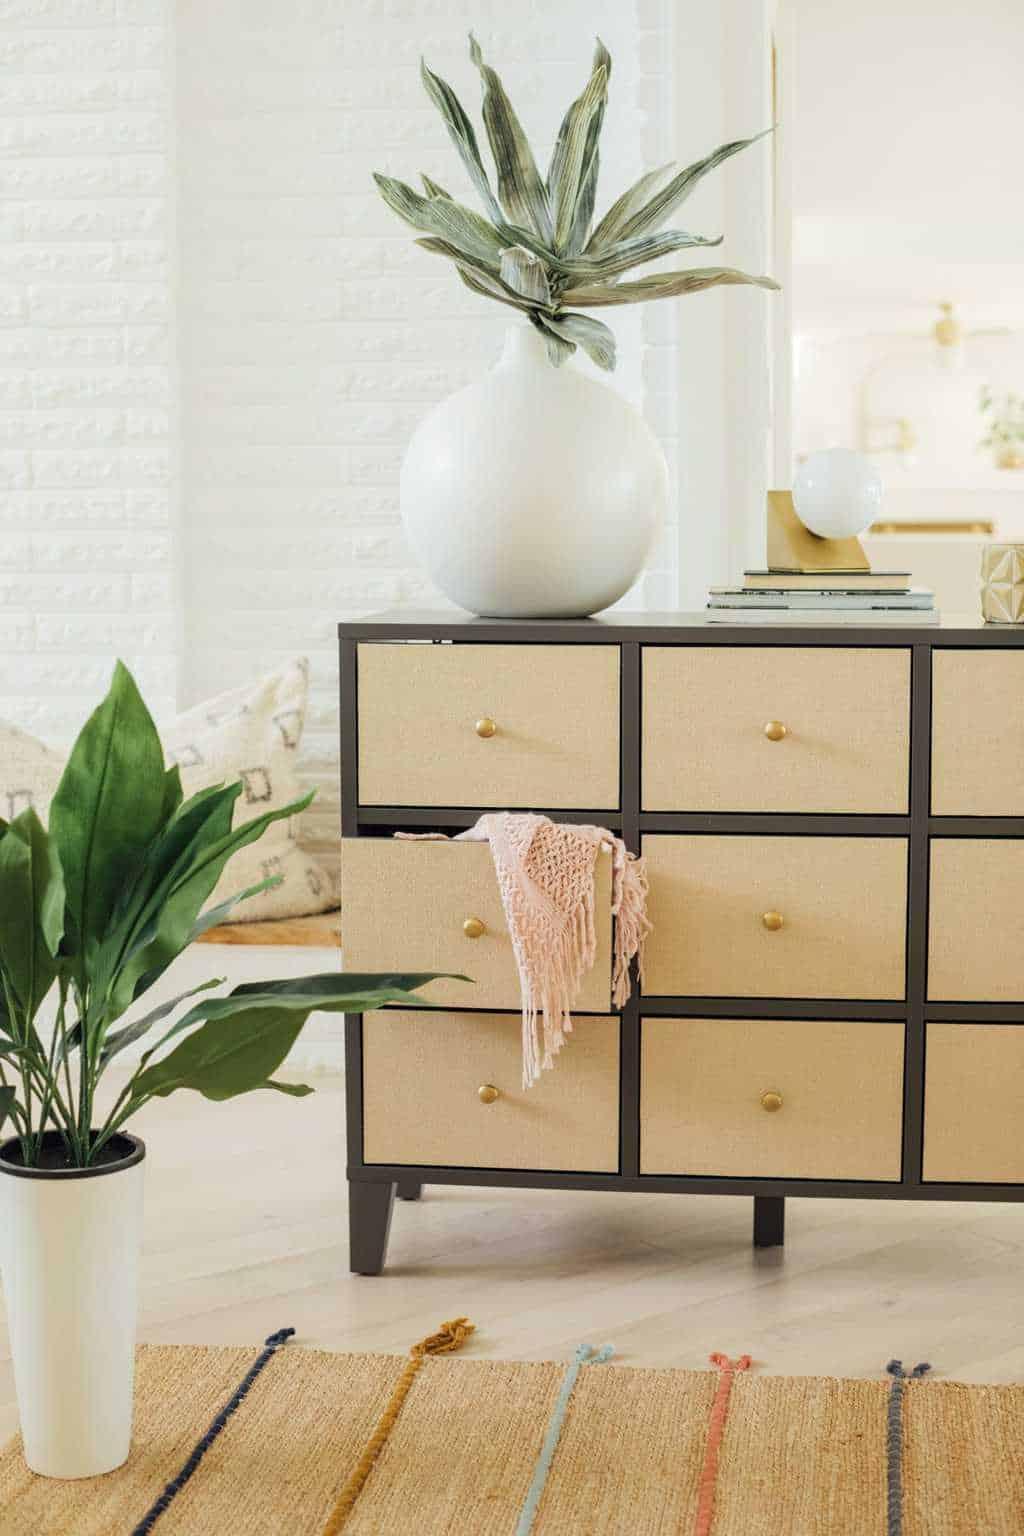 styled rattan DIY ikea hack drawers